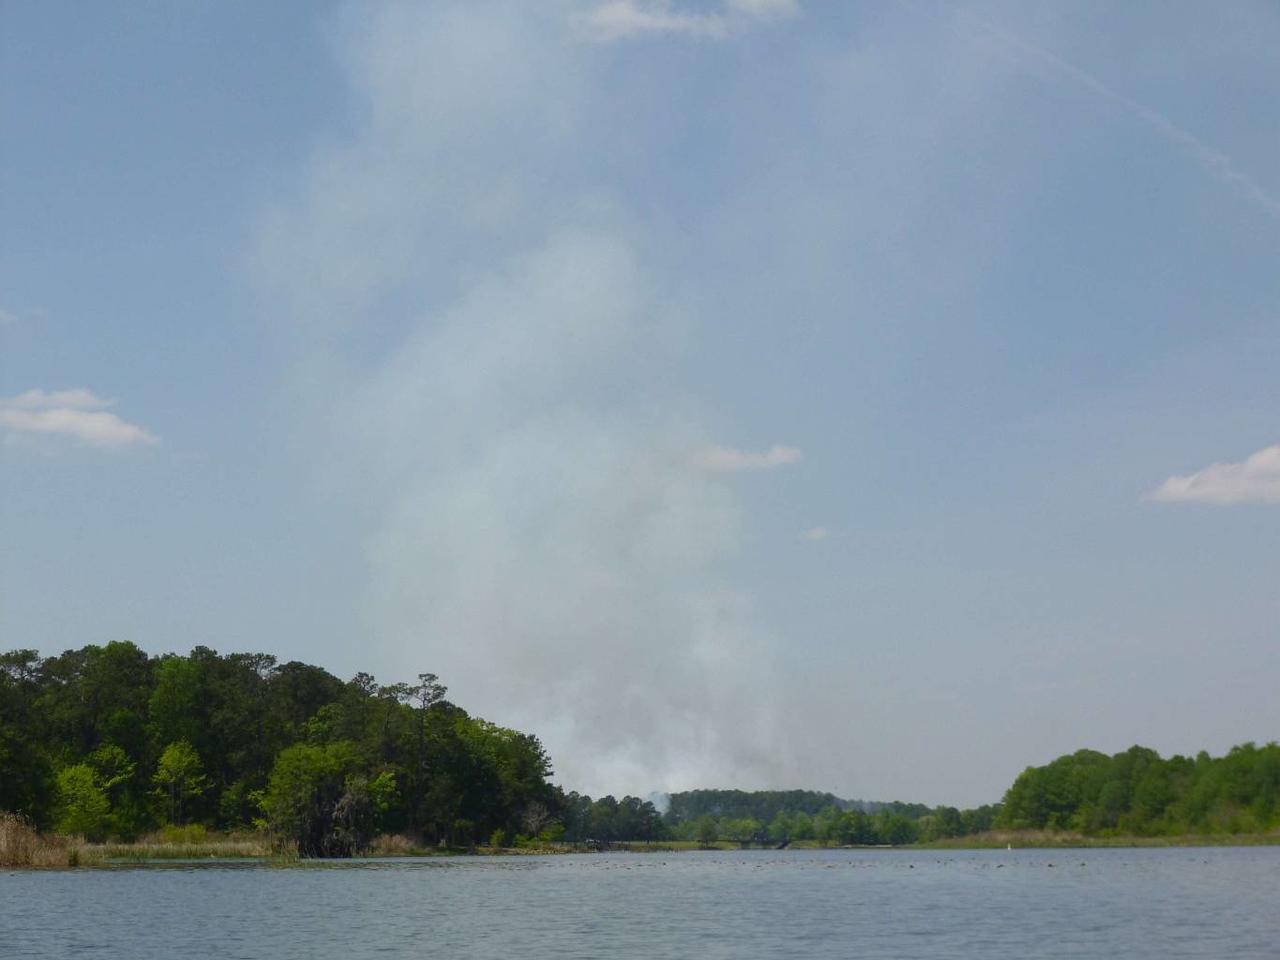 day 3 09 fire near CG P1020768-a-C